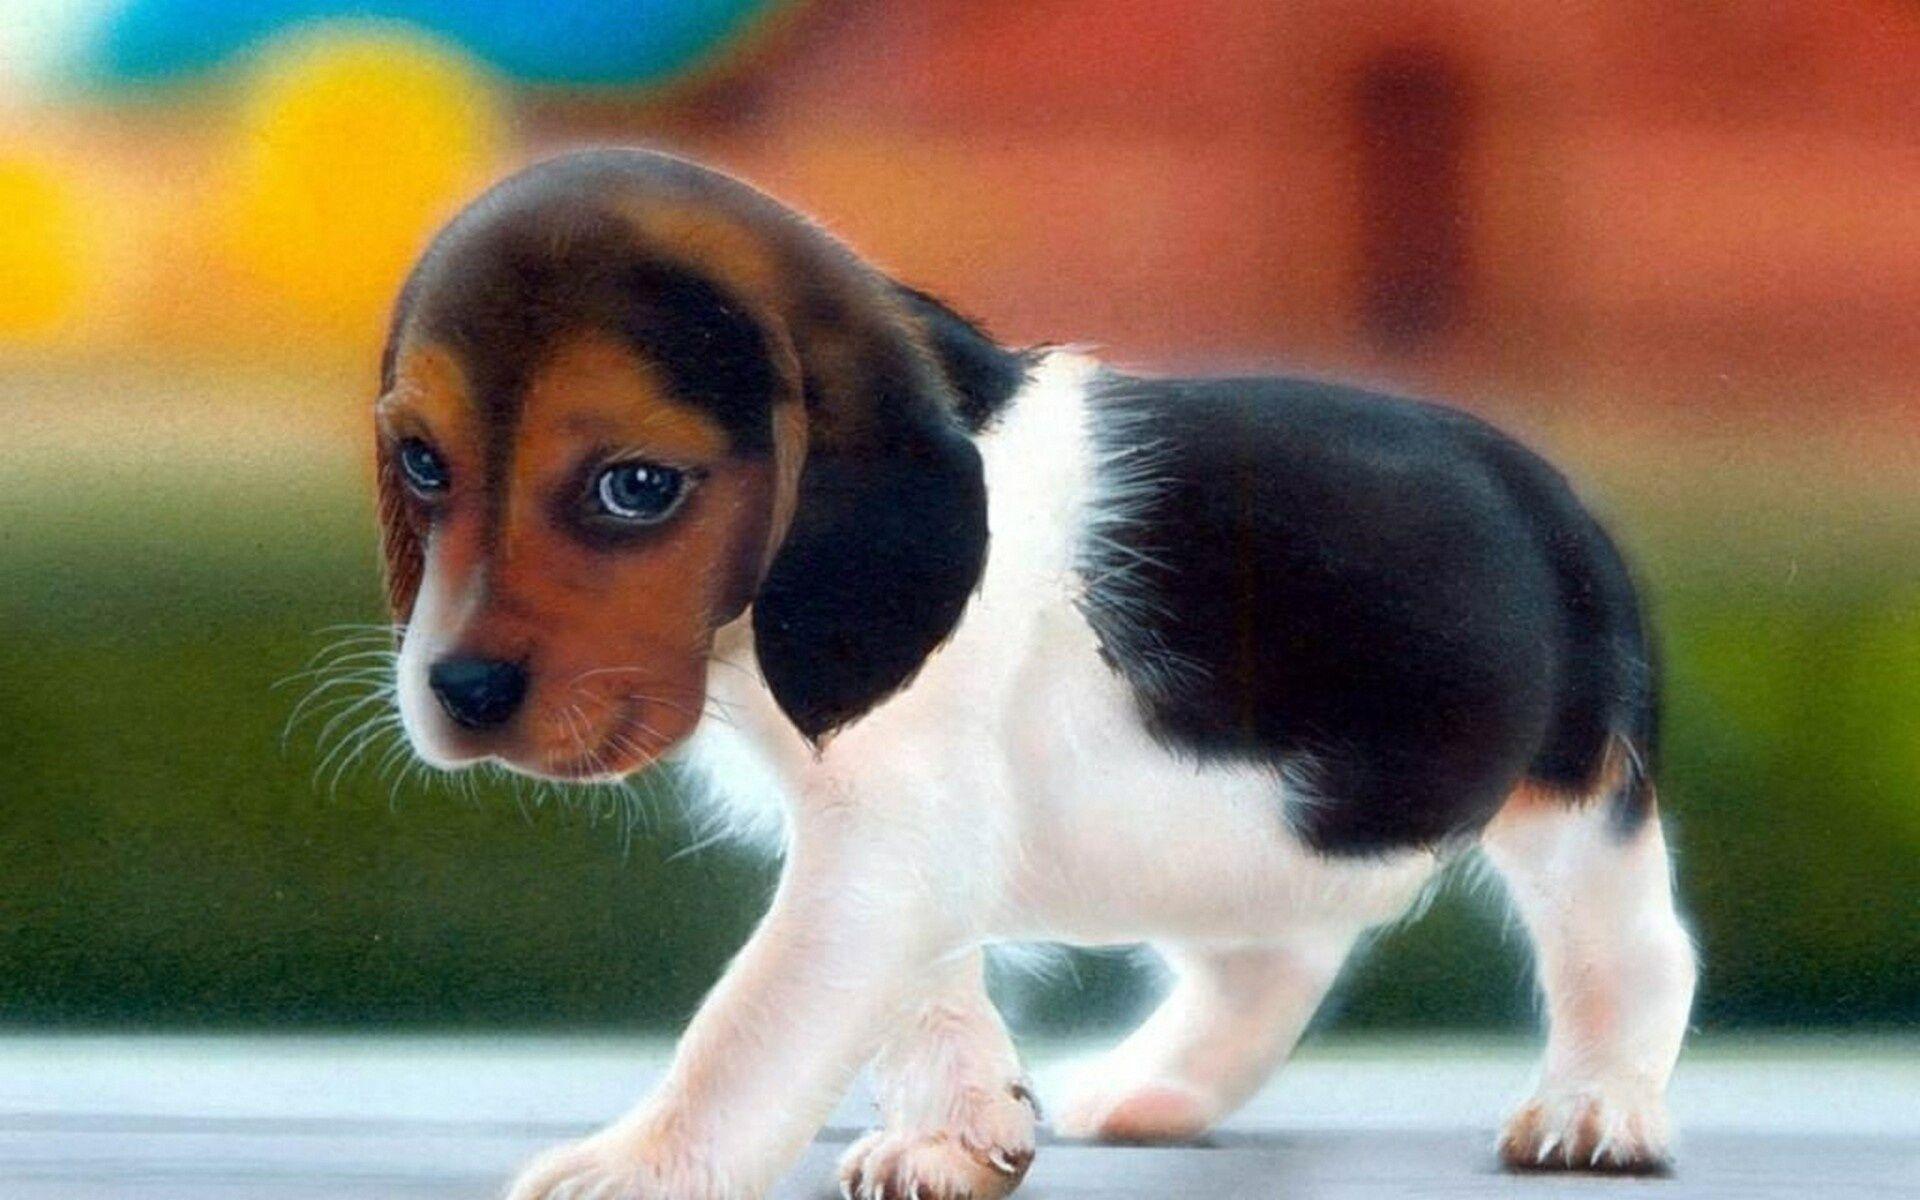 Cute Dog Wallpaper Cute Animal Pictures Cute Animals Cute